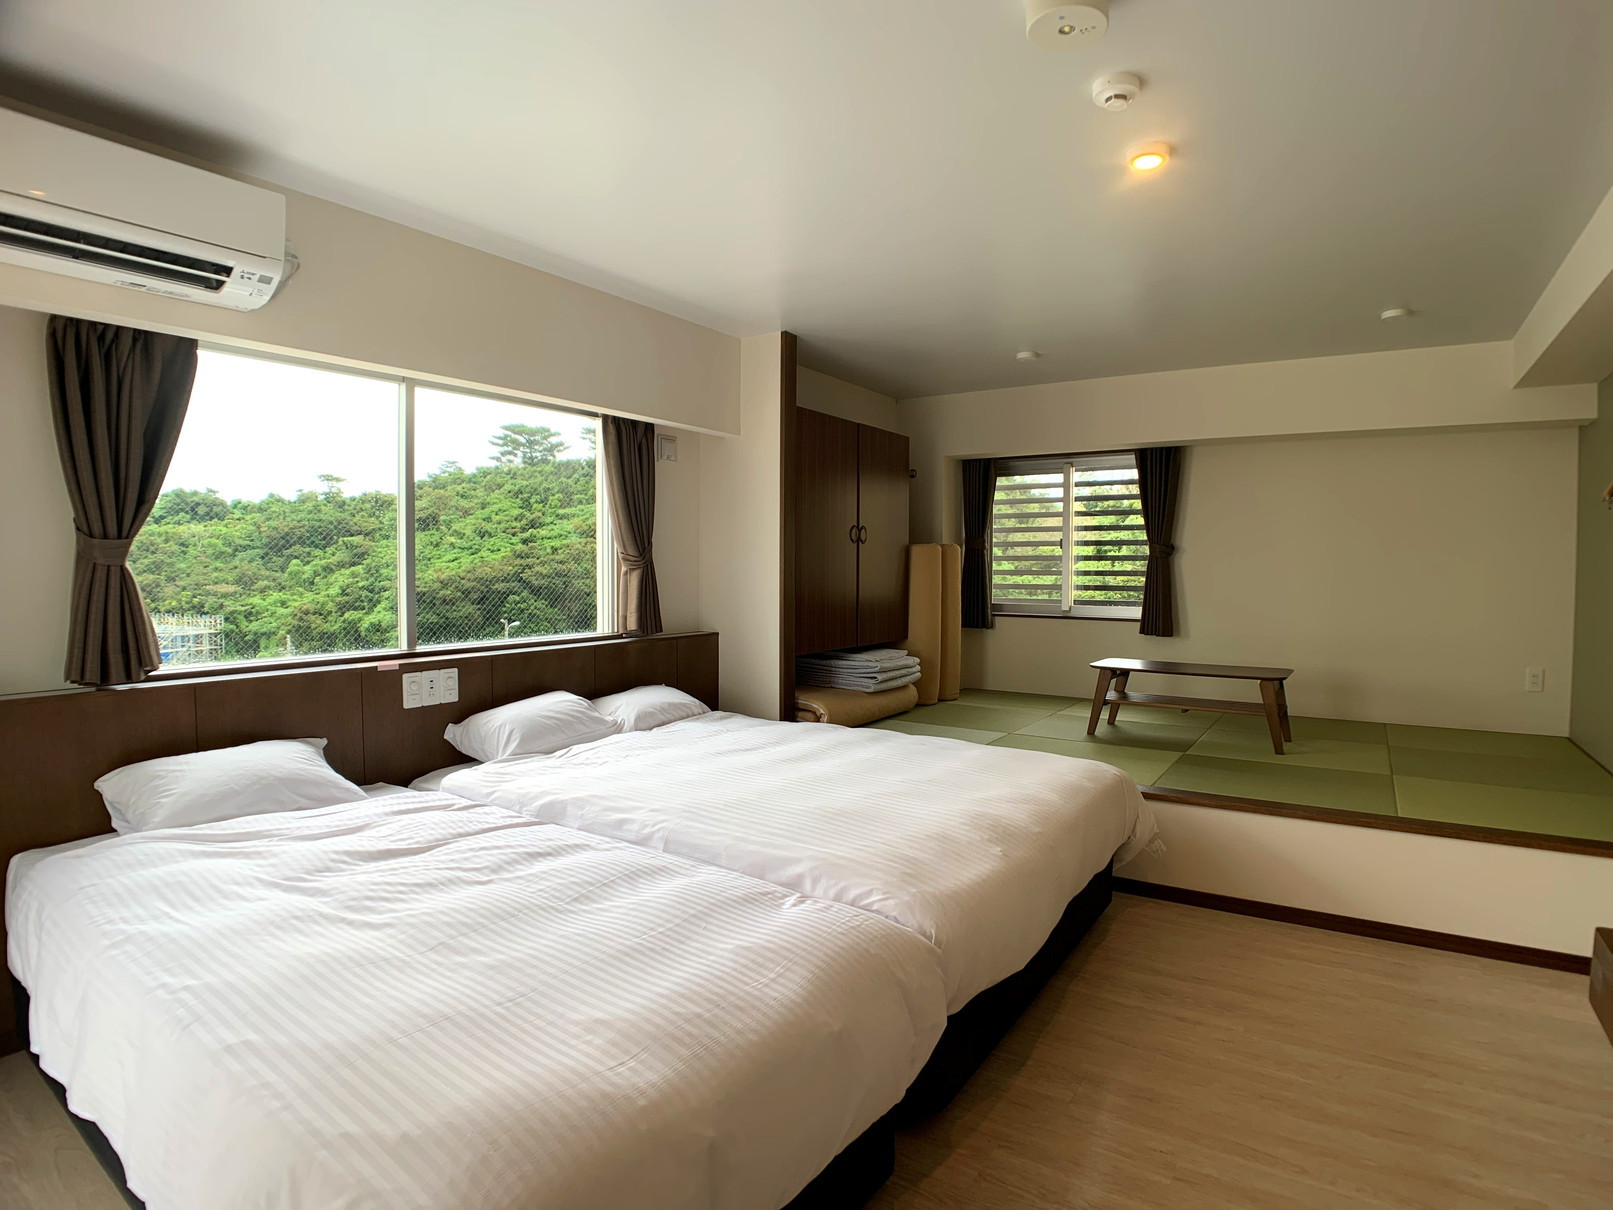 Aqua Resort in Chatan / 【宿カリ7】早めのご予約で人気の北谷で暮らすように旅をしよう!《素泊り》